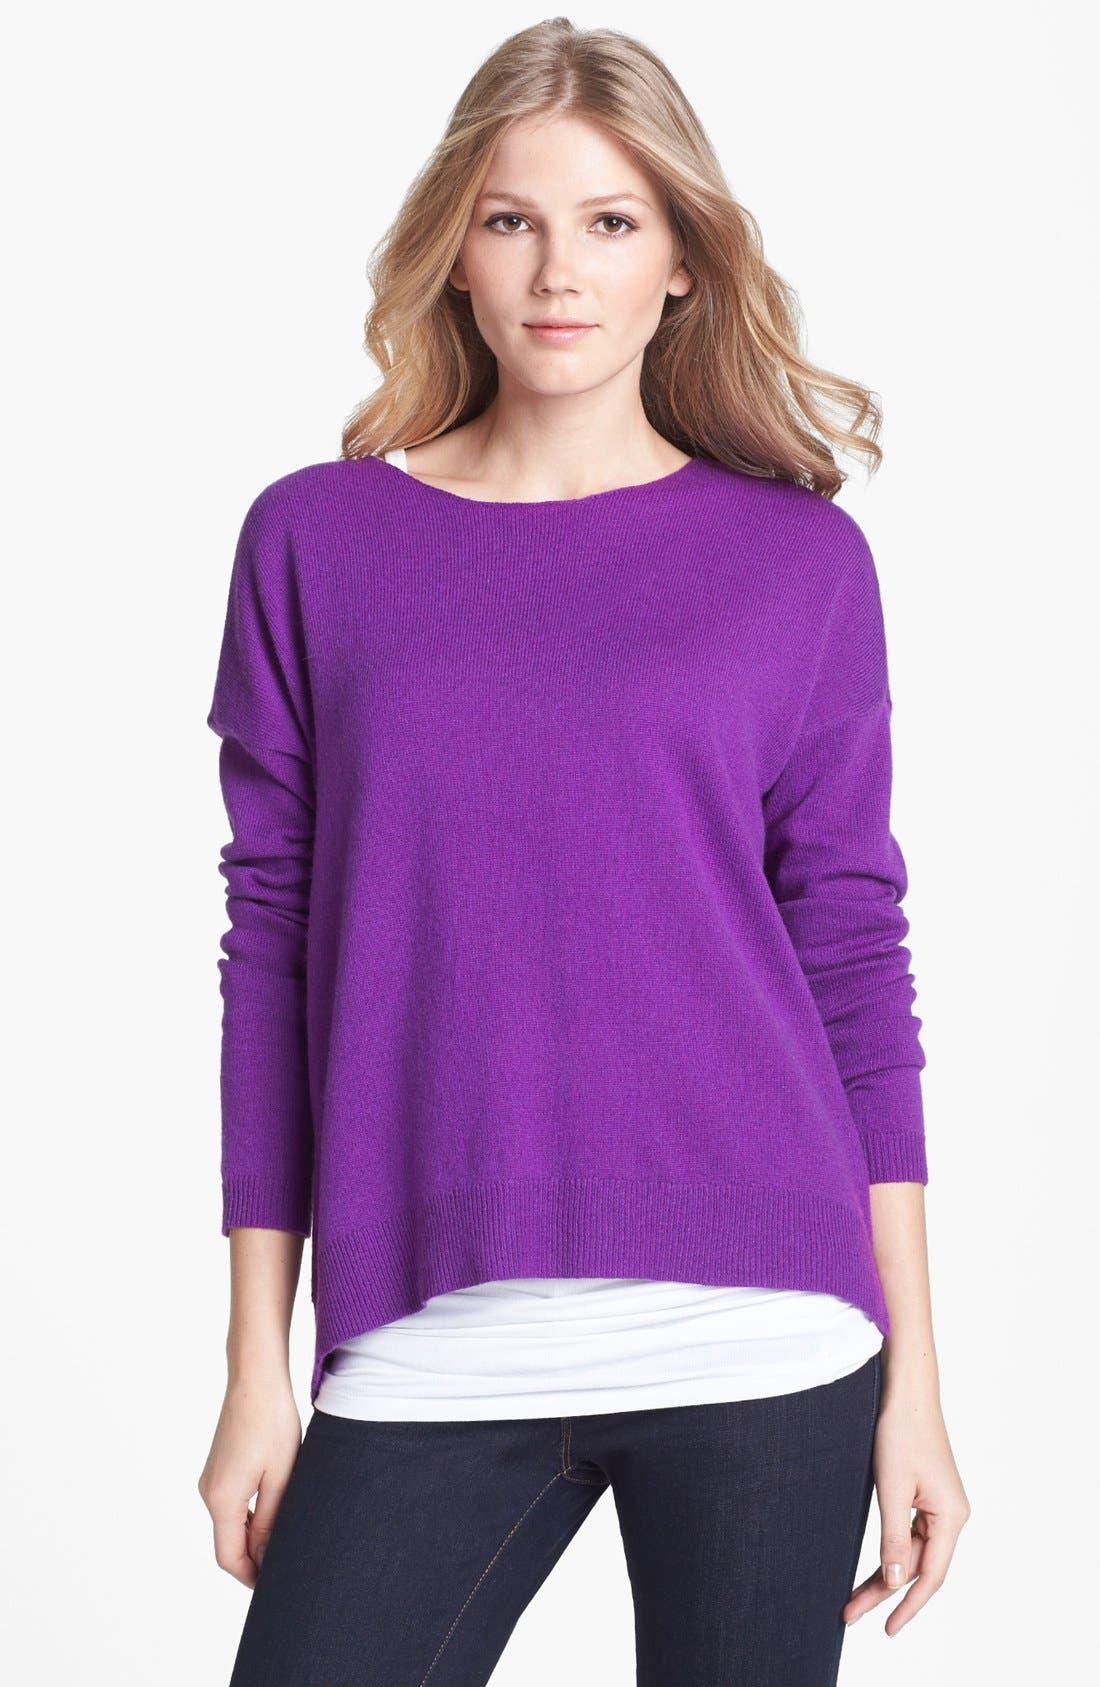 Alternate Image 1 Selected - Halogen® Wool & Cashmere Back Zip Sweater (Petite)